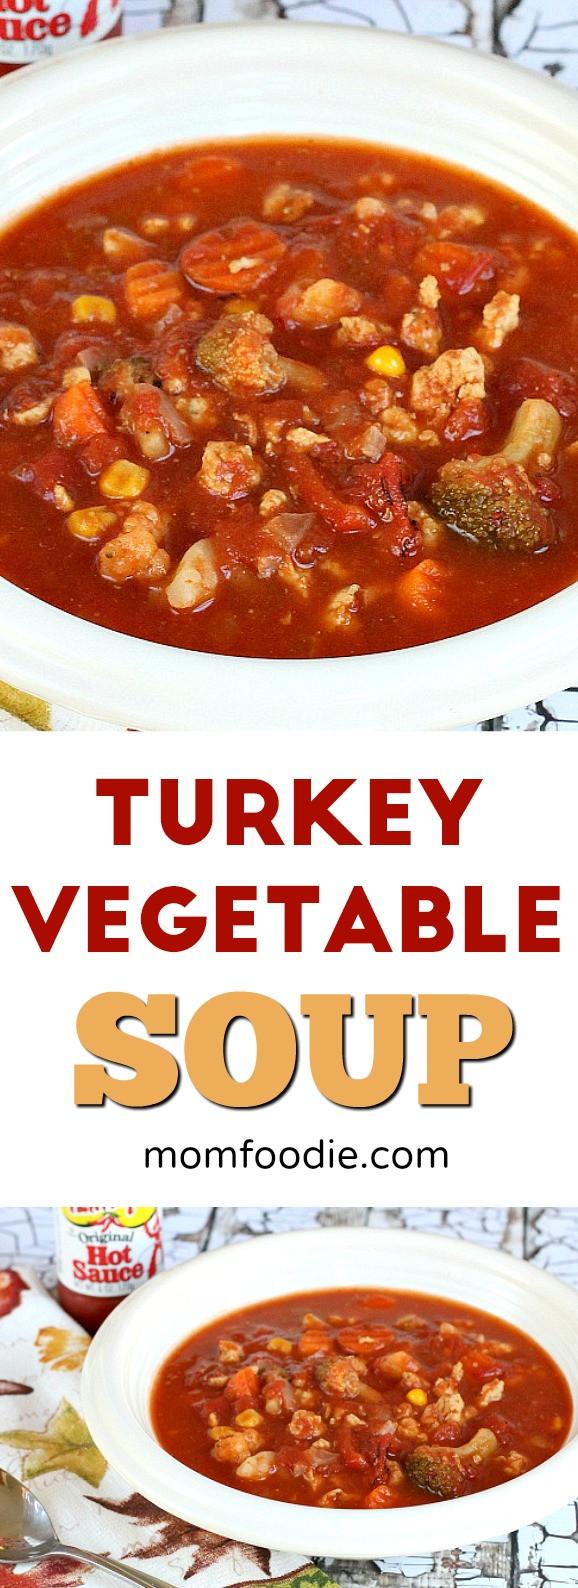 Low Calorie Ground Turkey Recipes  Turkey Ve able Soup Recipe an easy low calorie soup